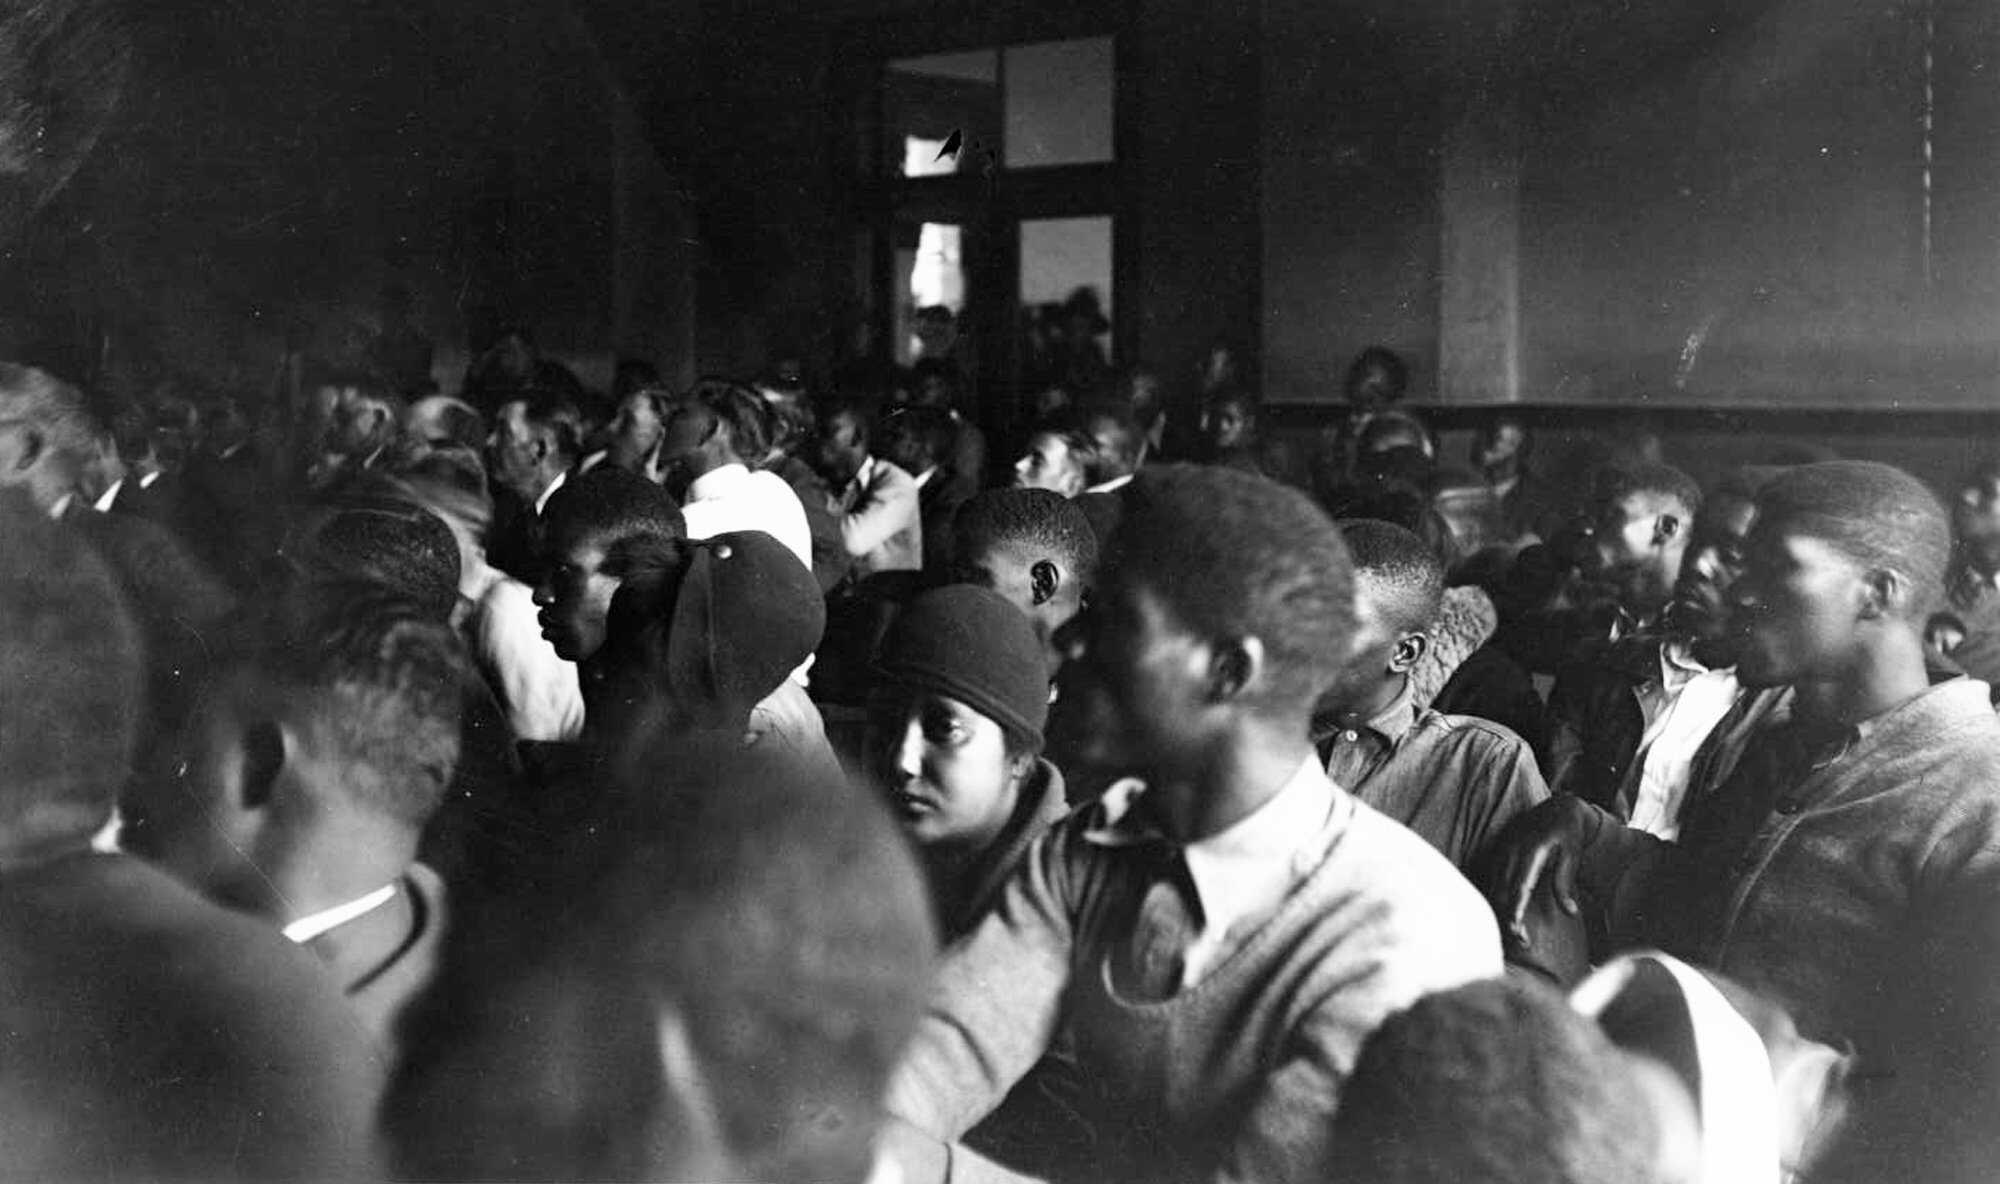 scottsboro-timeline-1934_courtroom.jpg